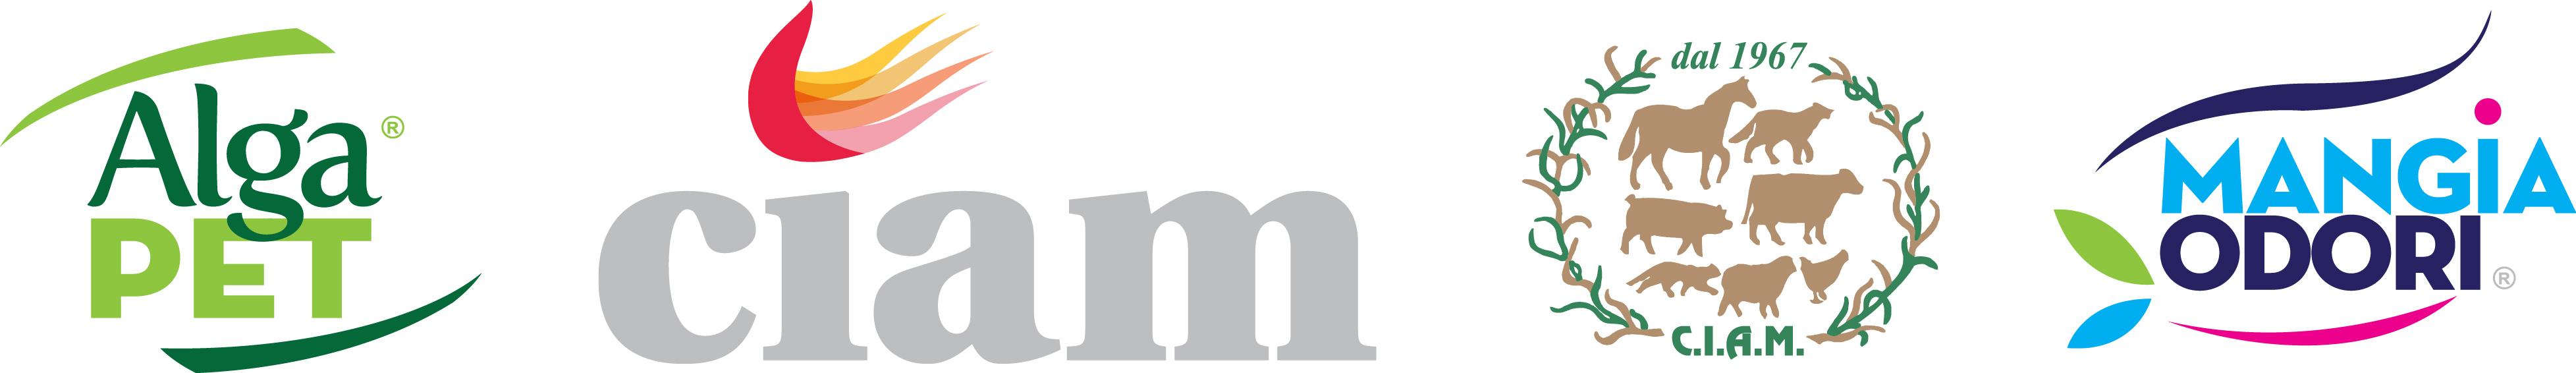 Banner Ciam 1